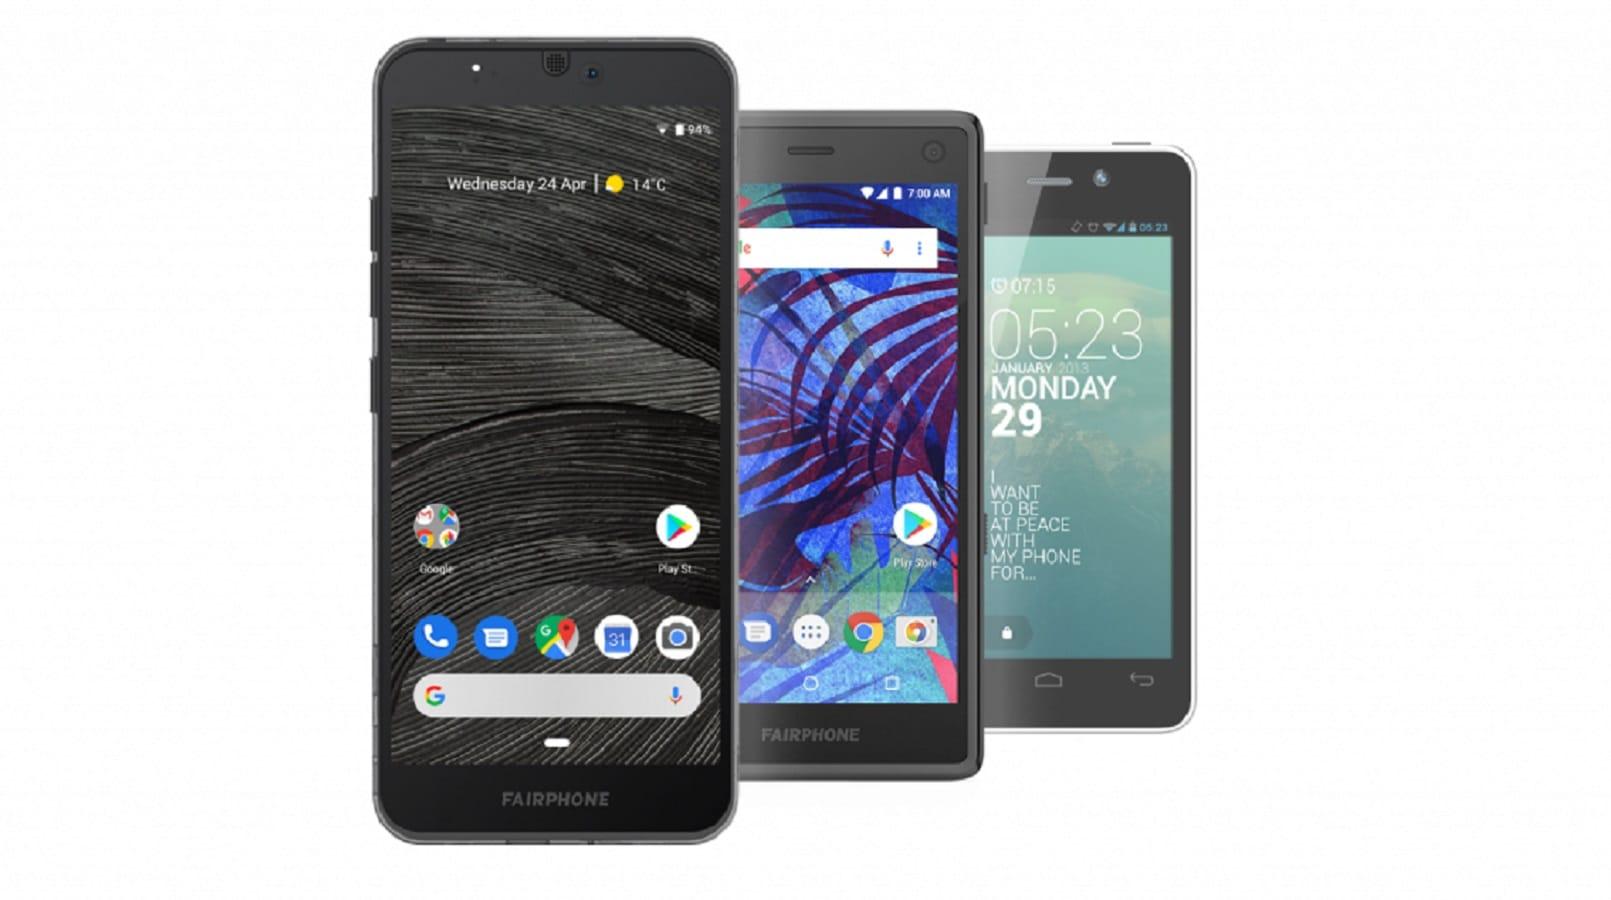 fairphone 3 smartphone